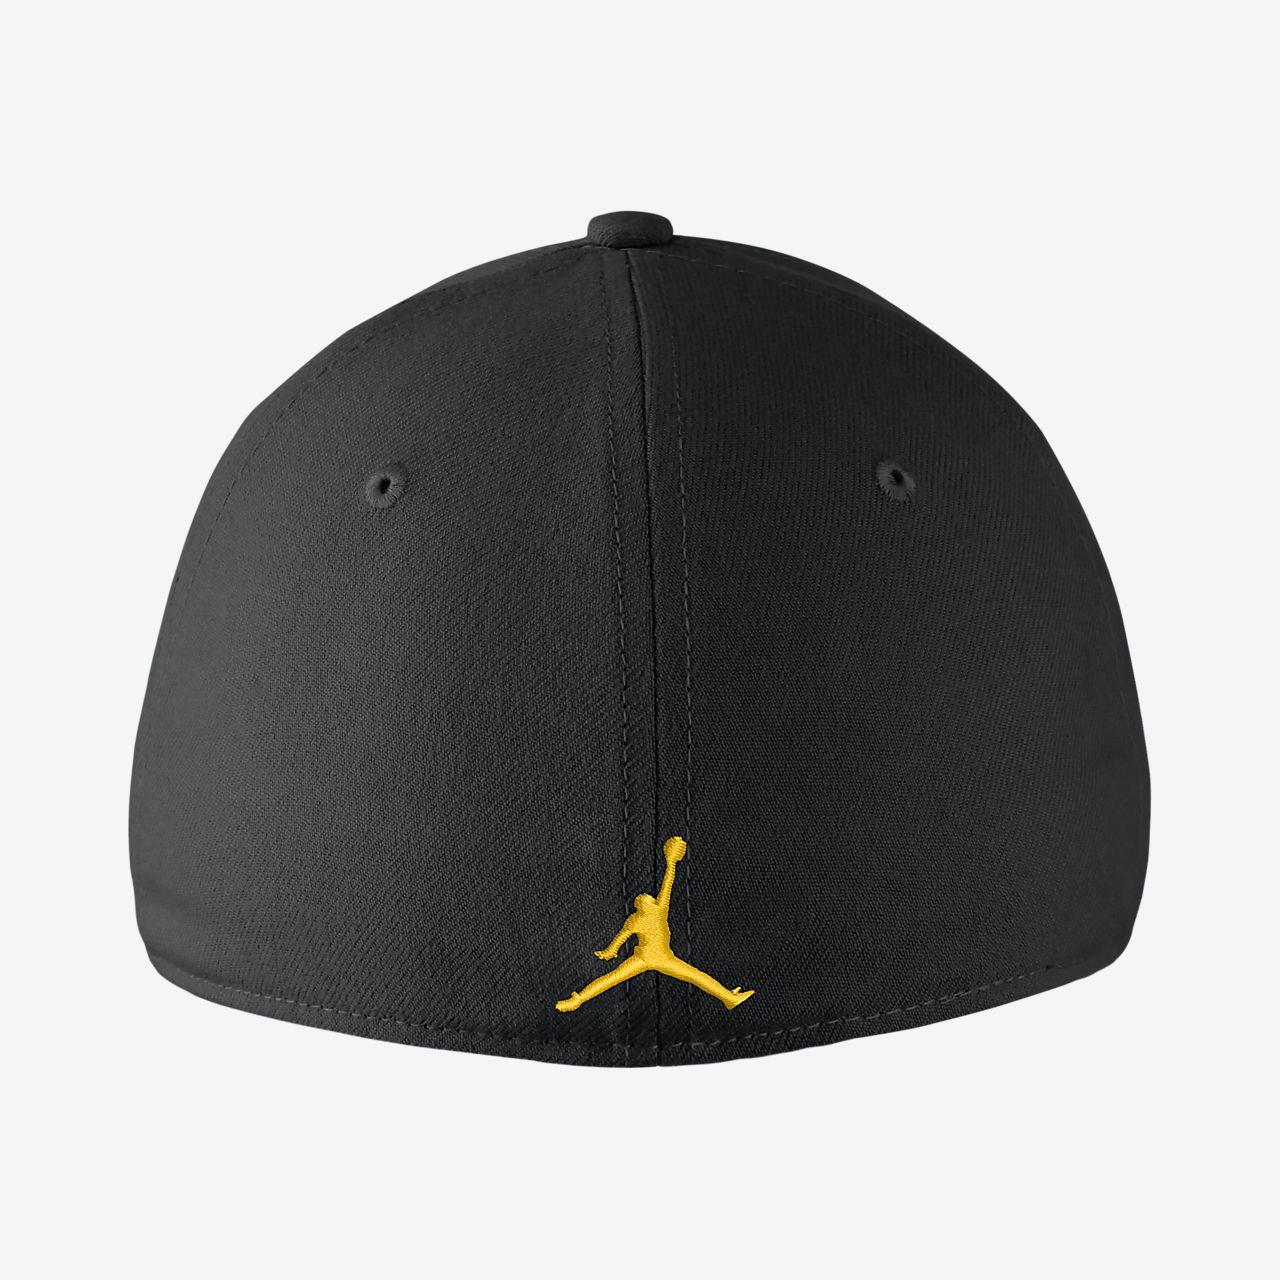 italy jordan 5 panel hats fit b3760 762ed 37783cb532a